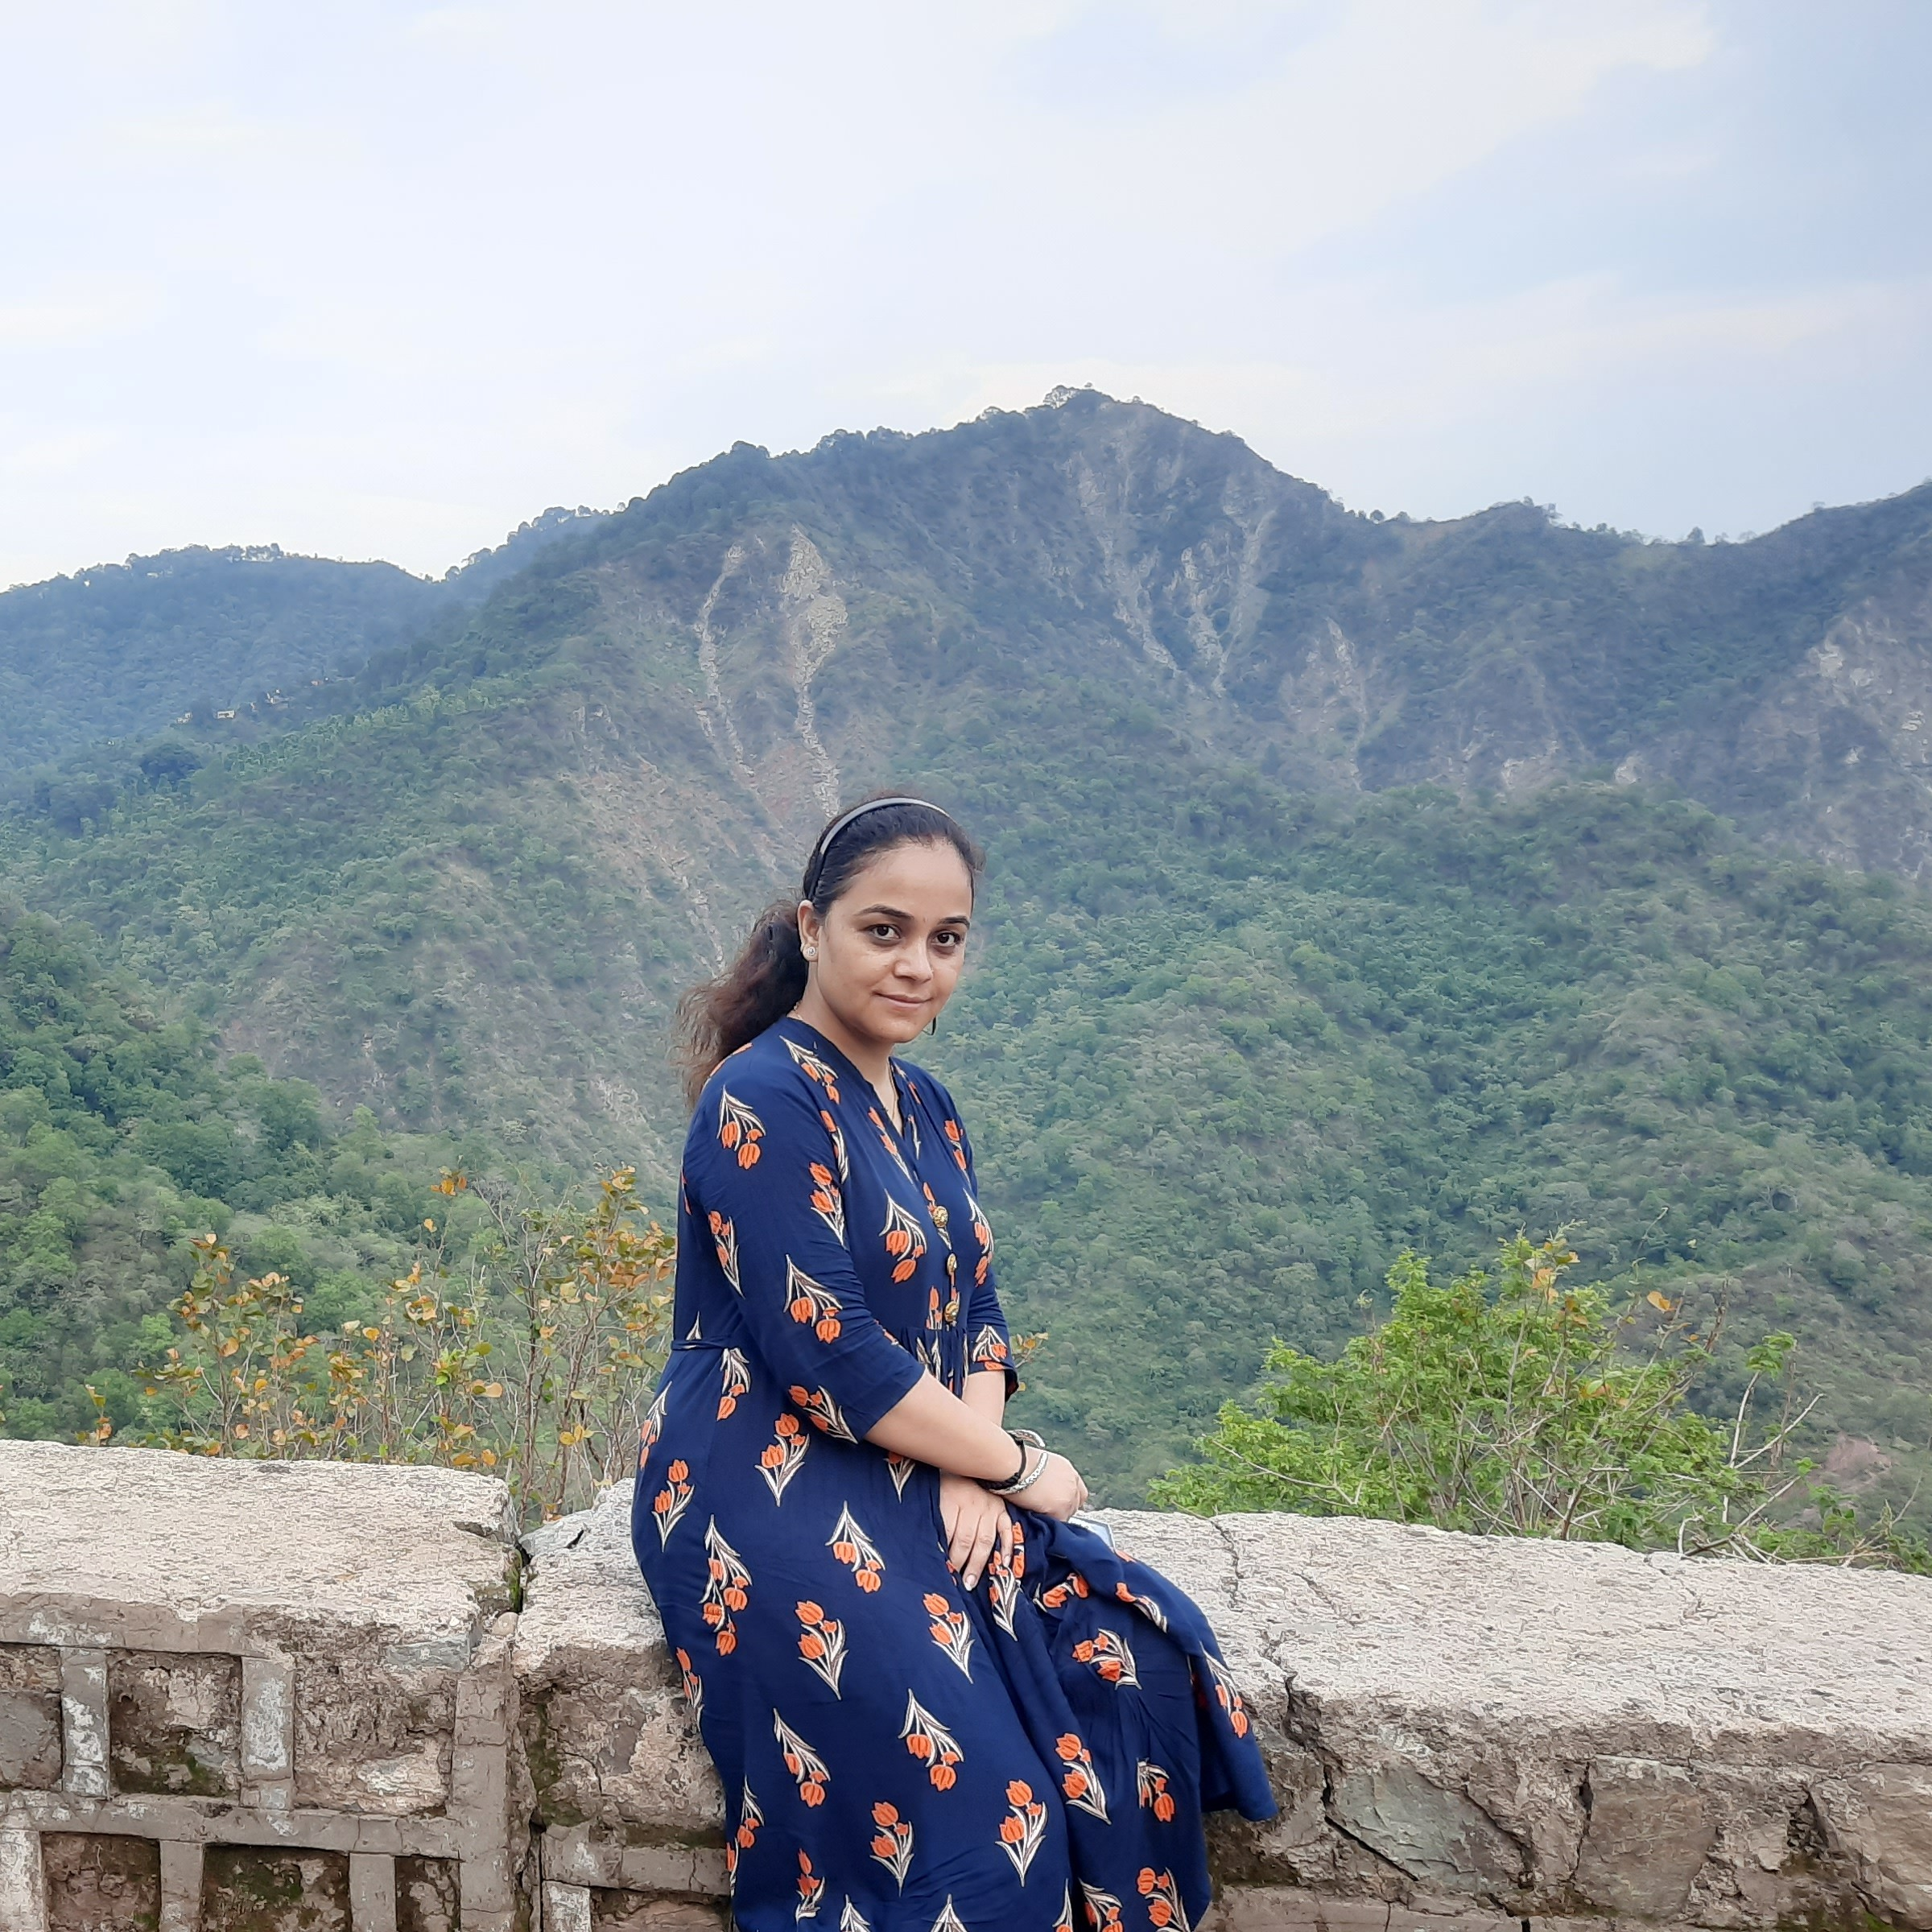 Anshula Thakur